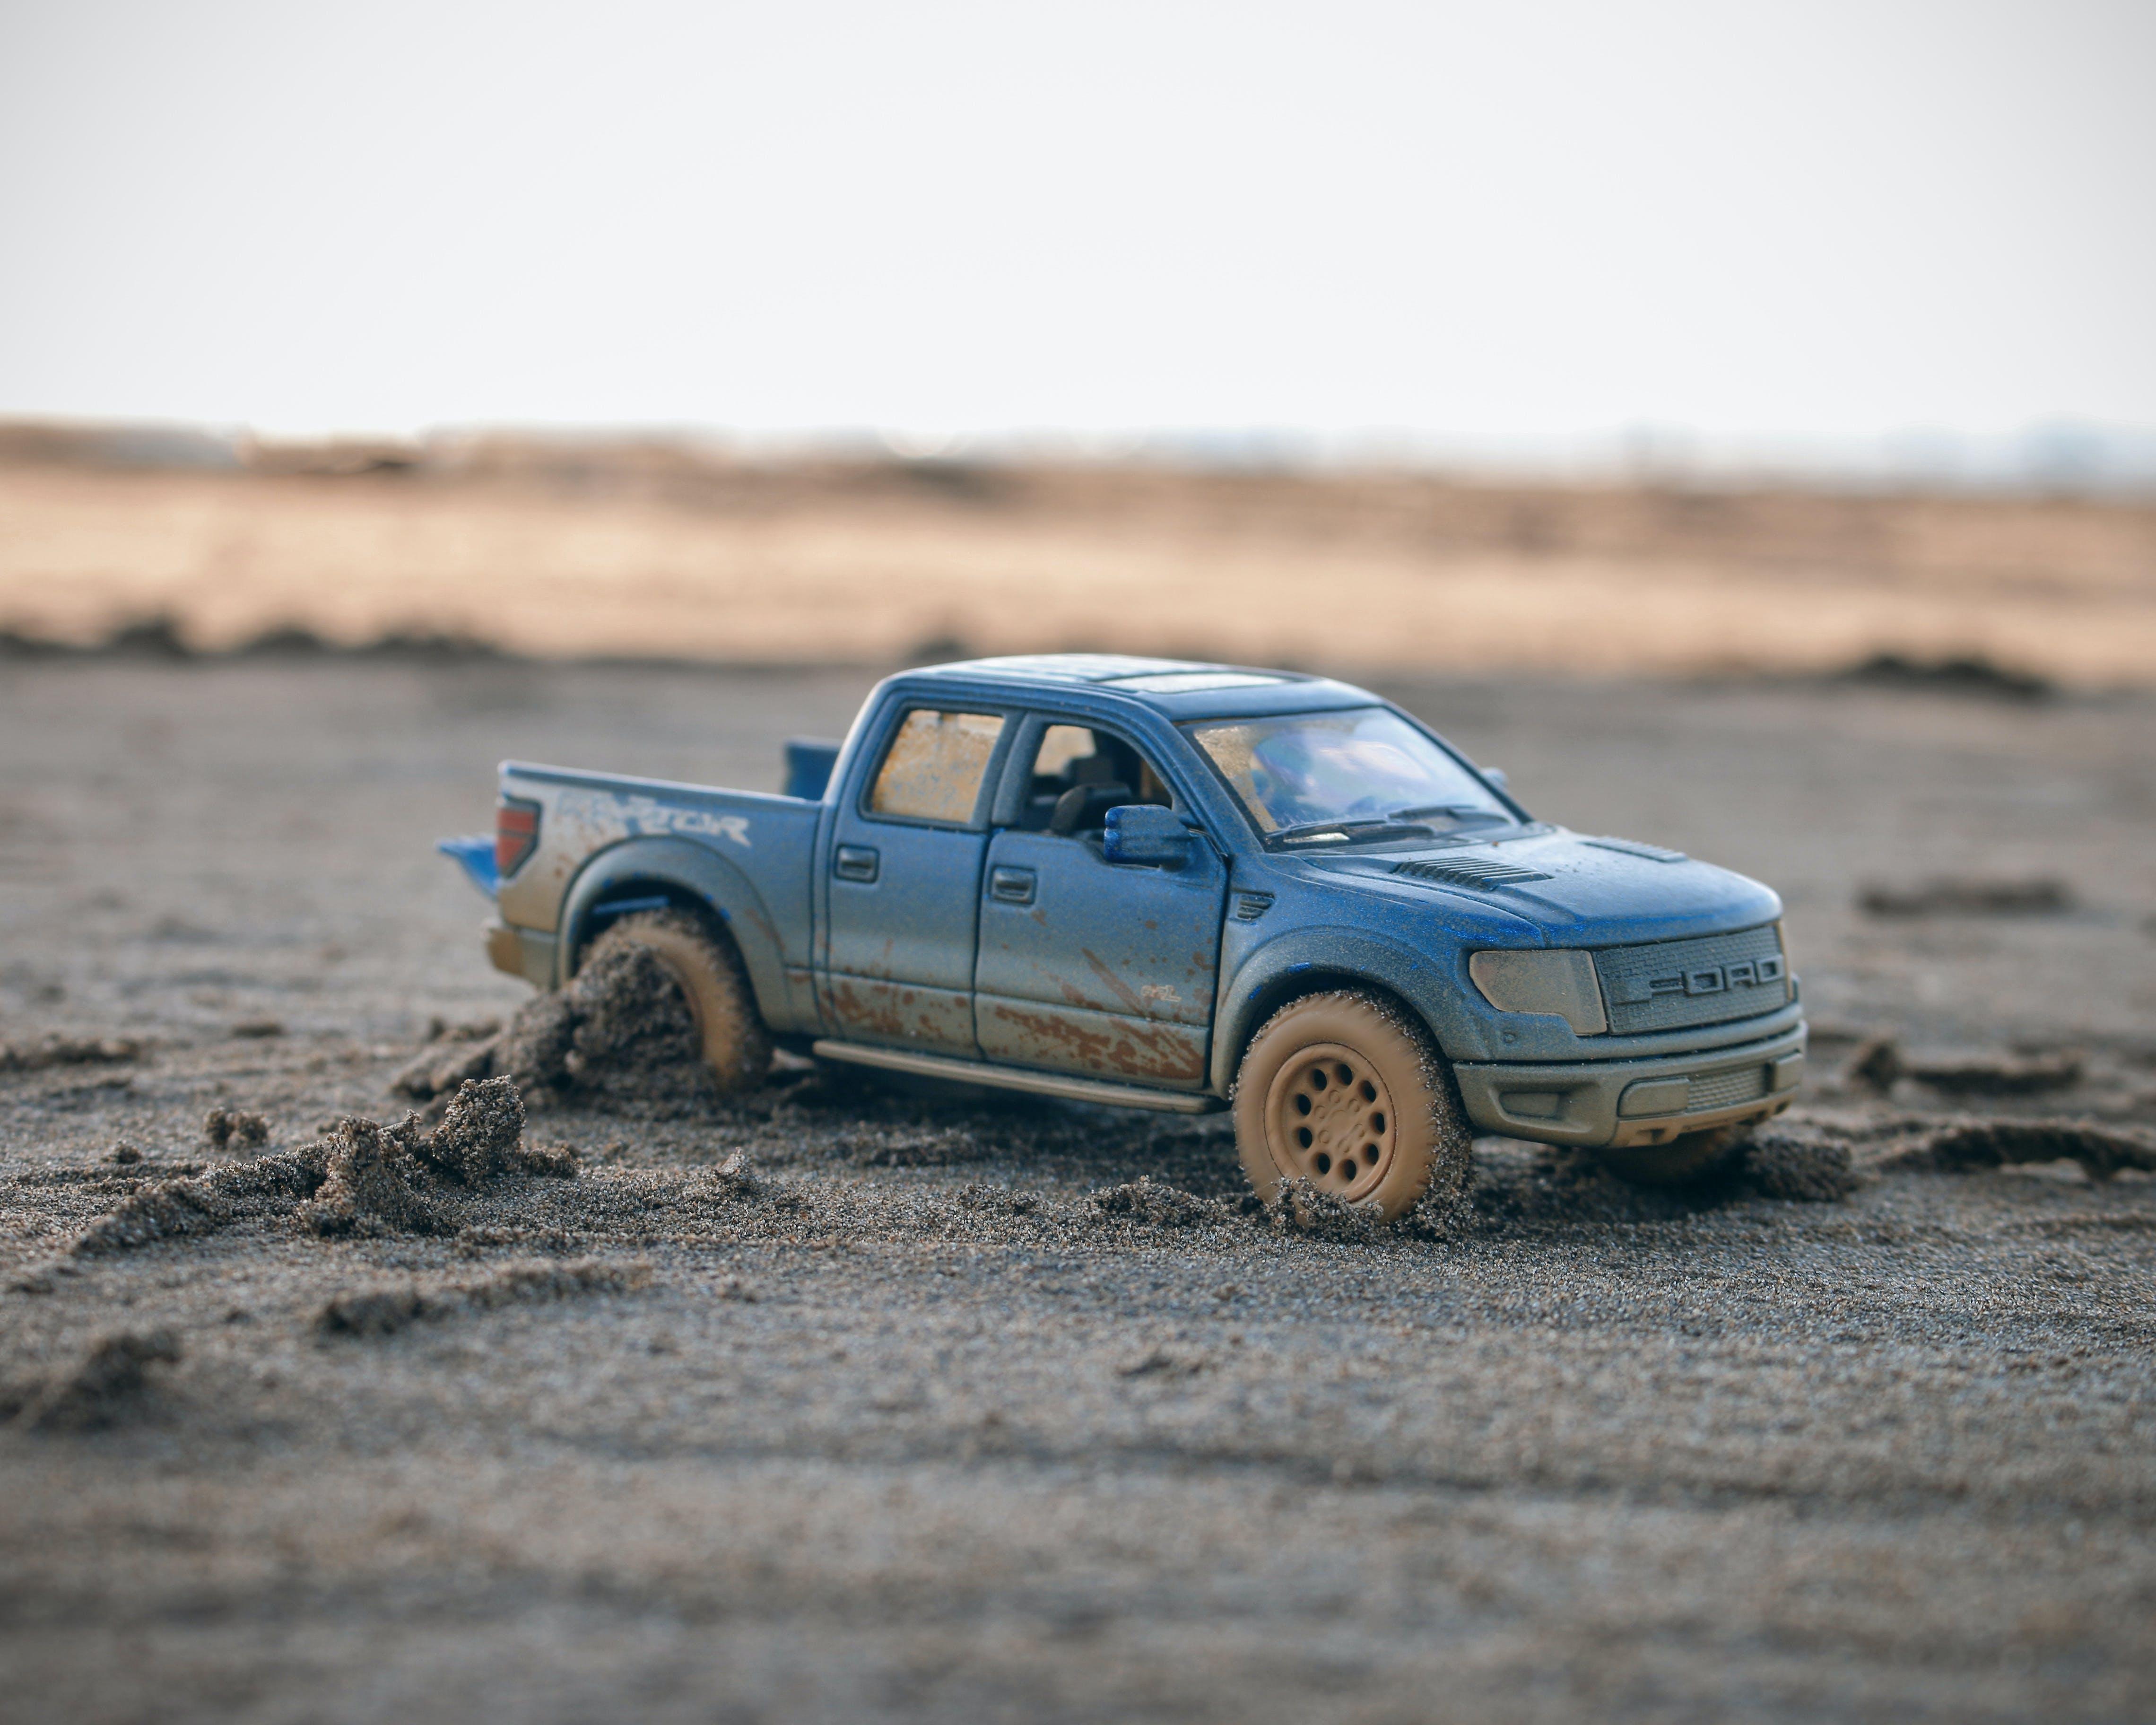 Free stock photo of american car, beach, car, car toy